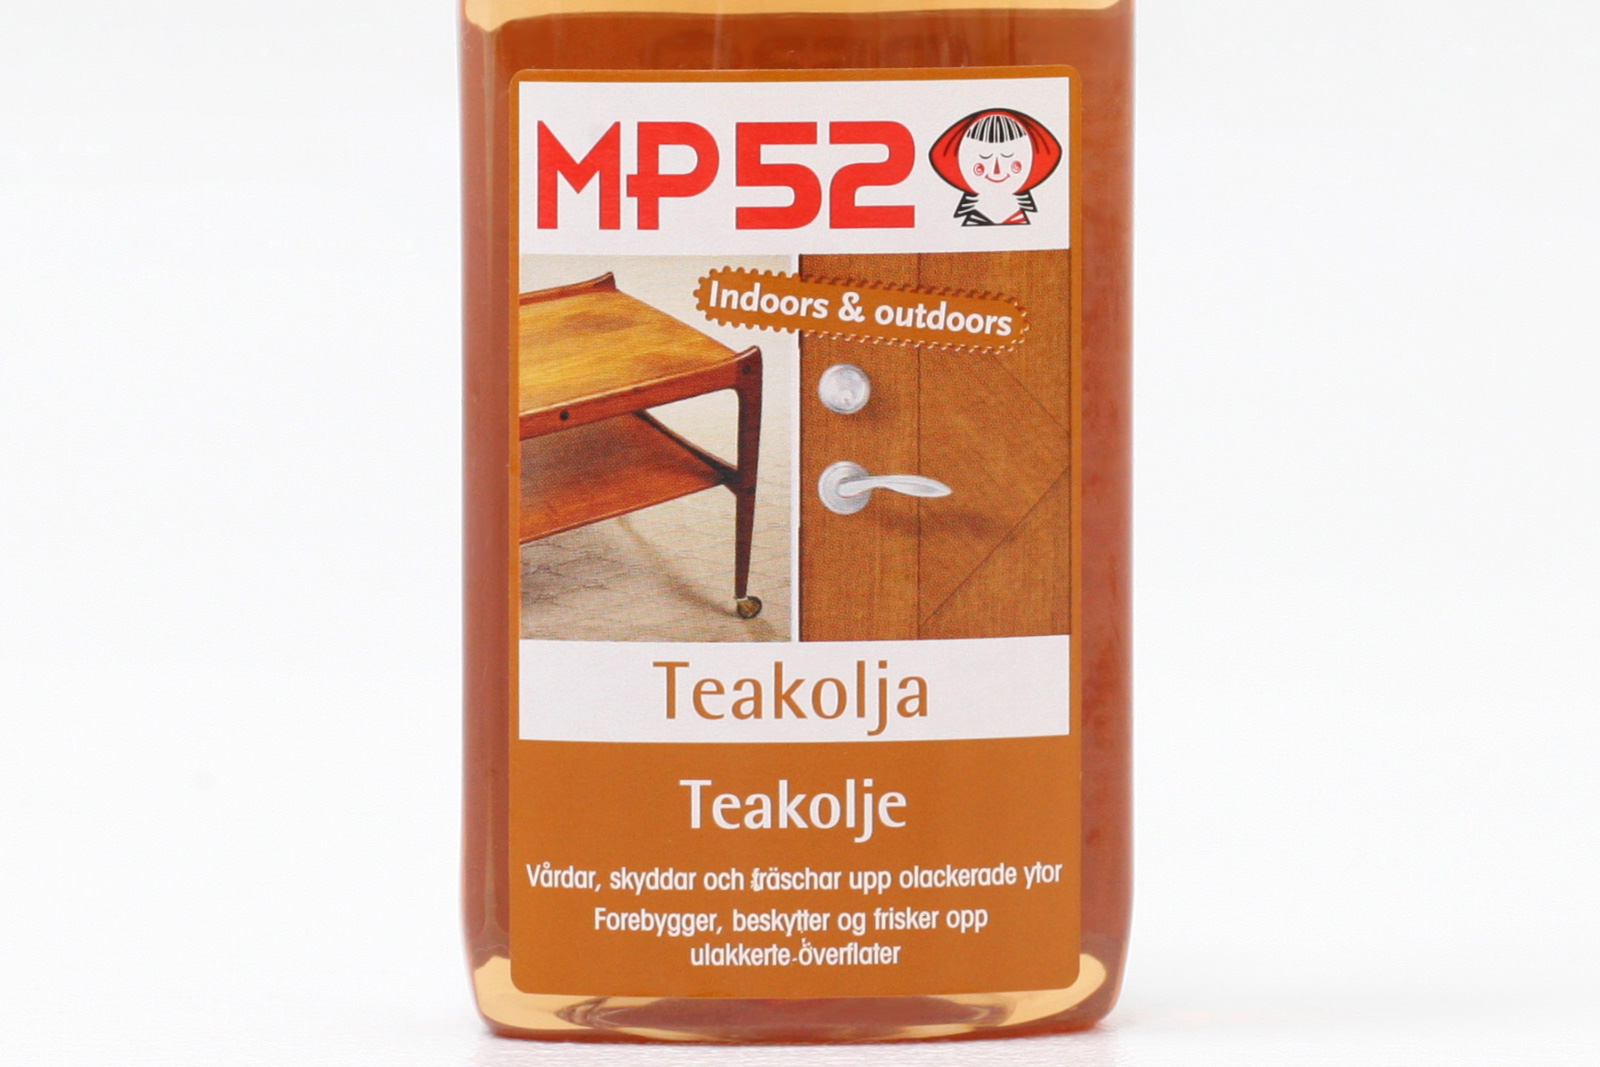 MP52-2